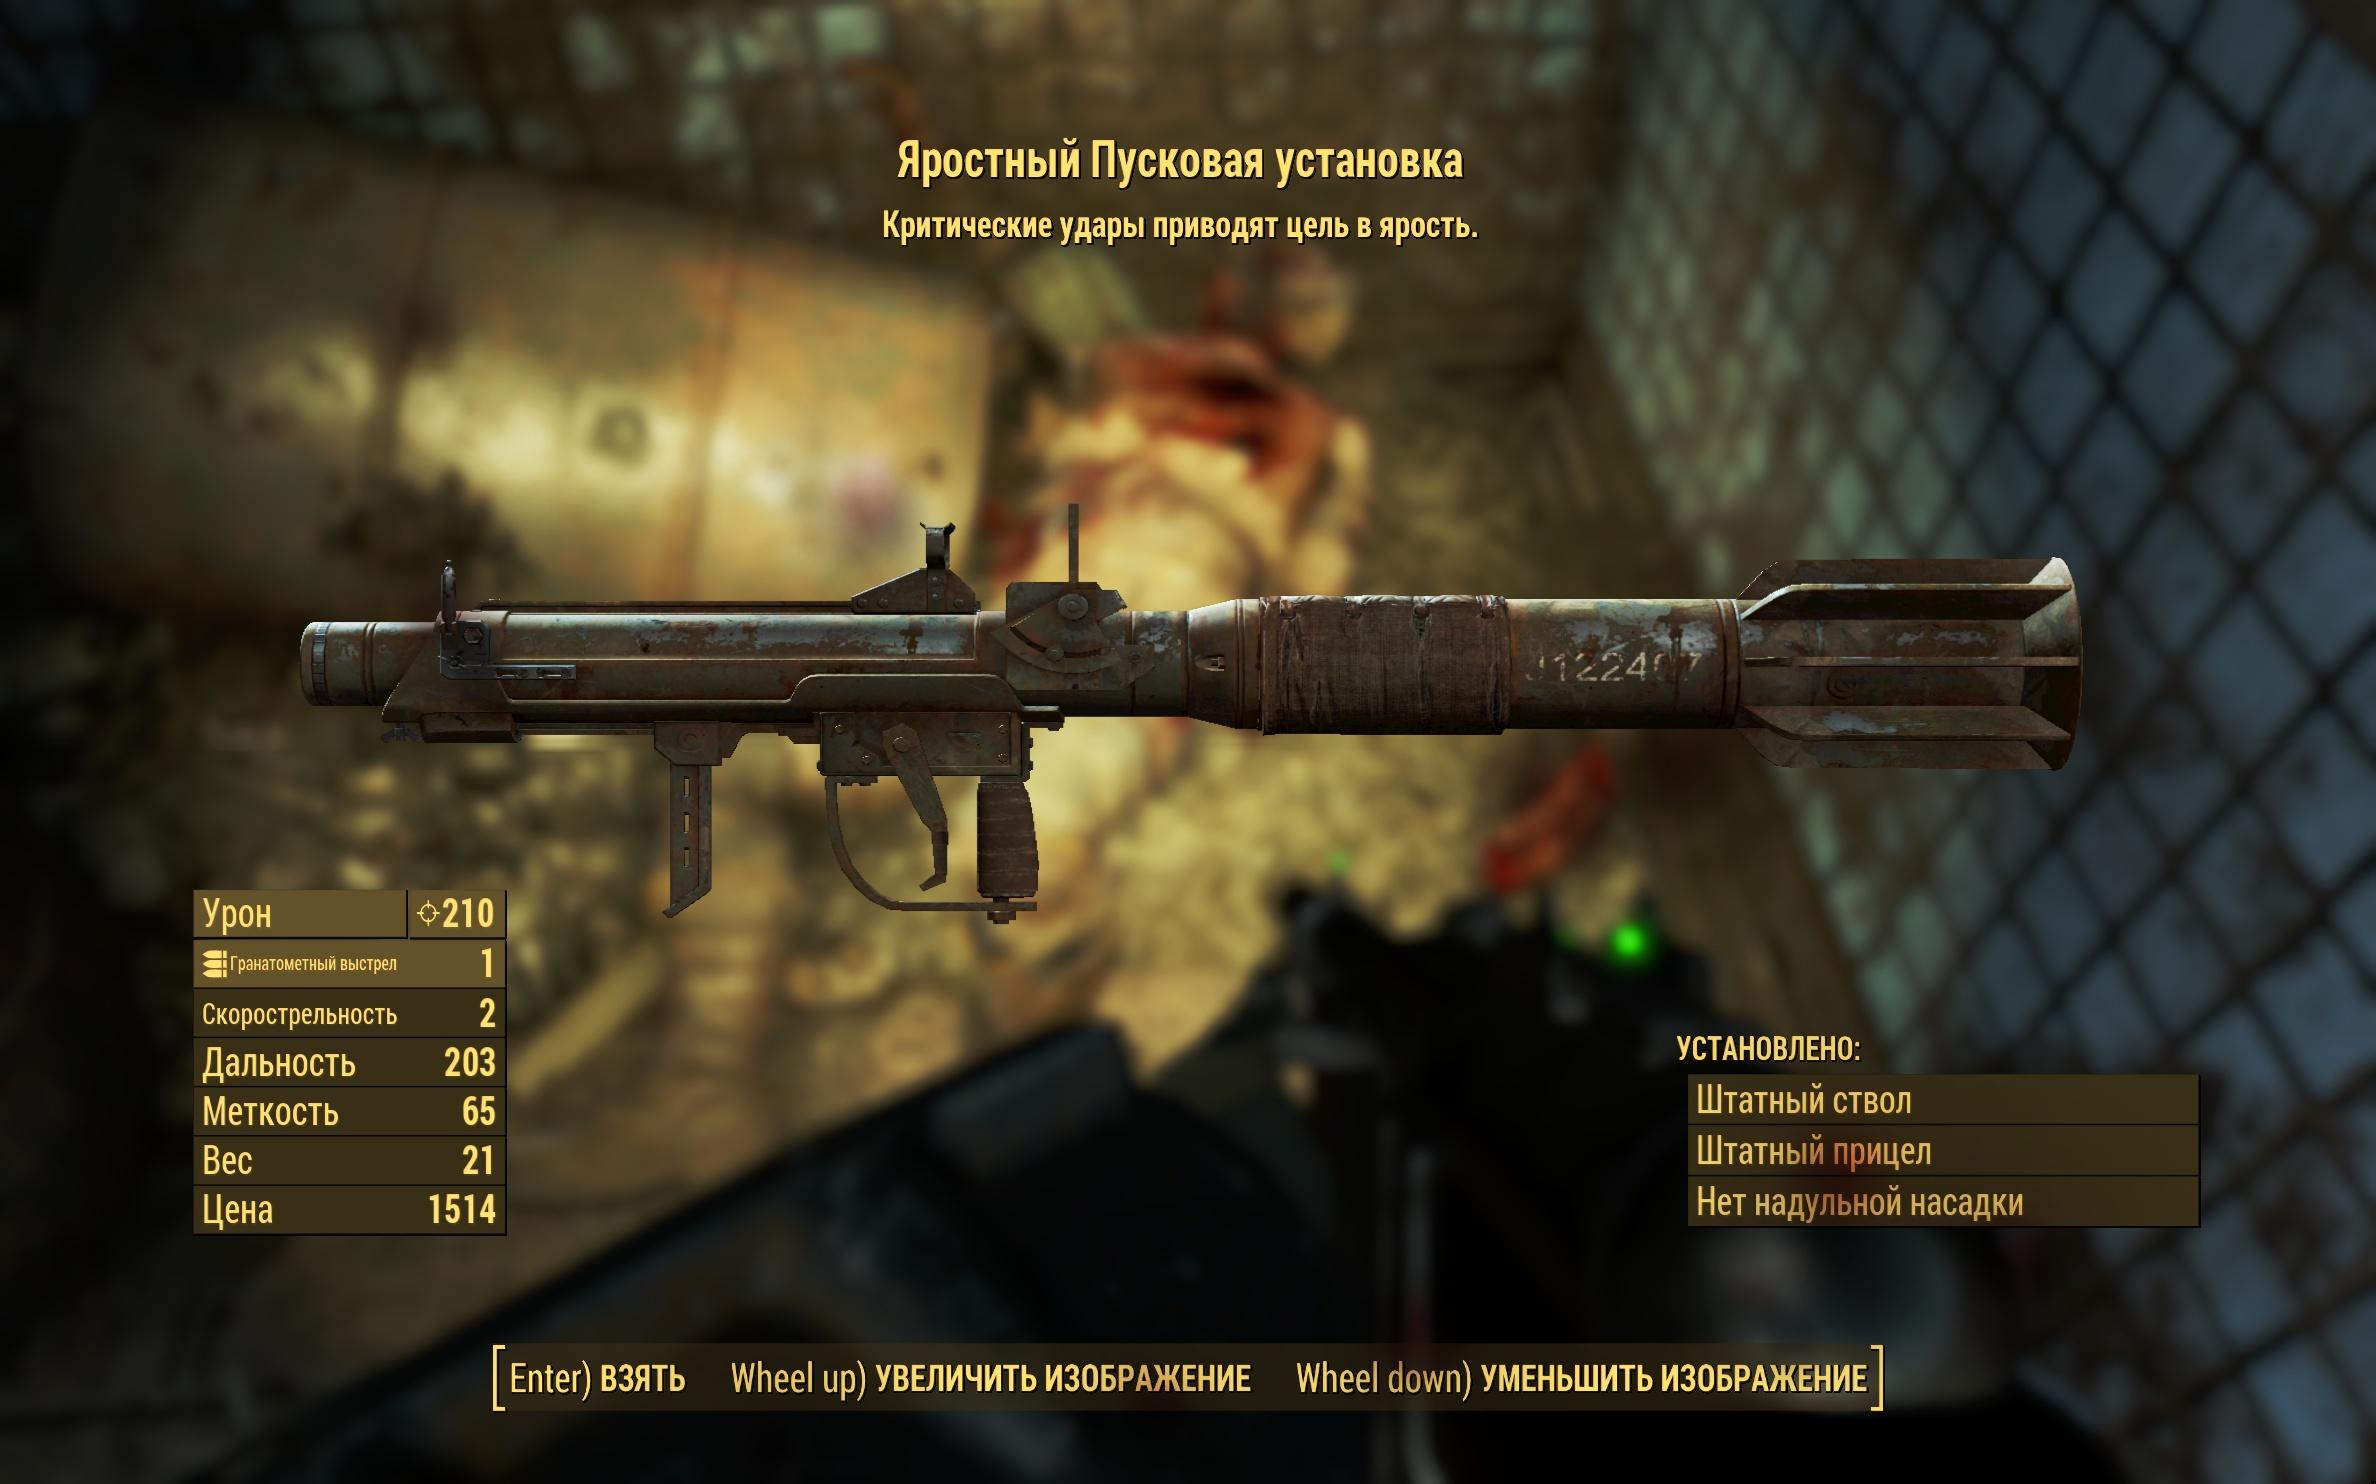 Яростный пусковая установка - Fallout 4 Оружие, пусковая, установка, Яростный